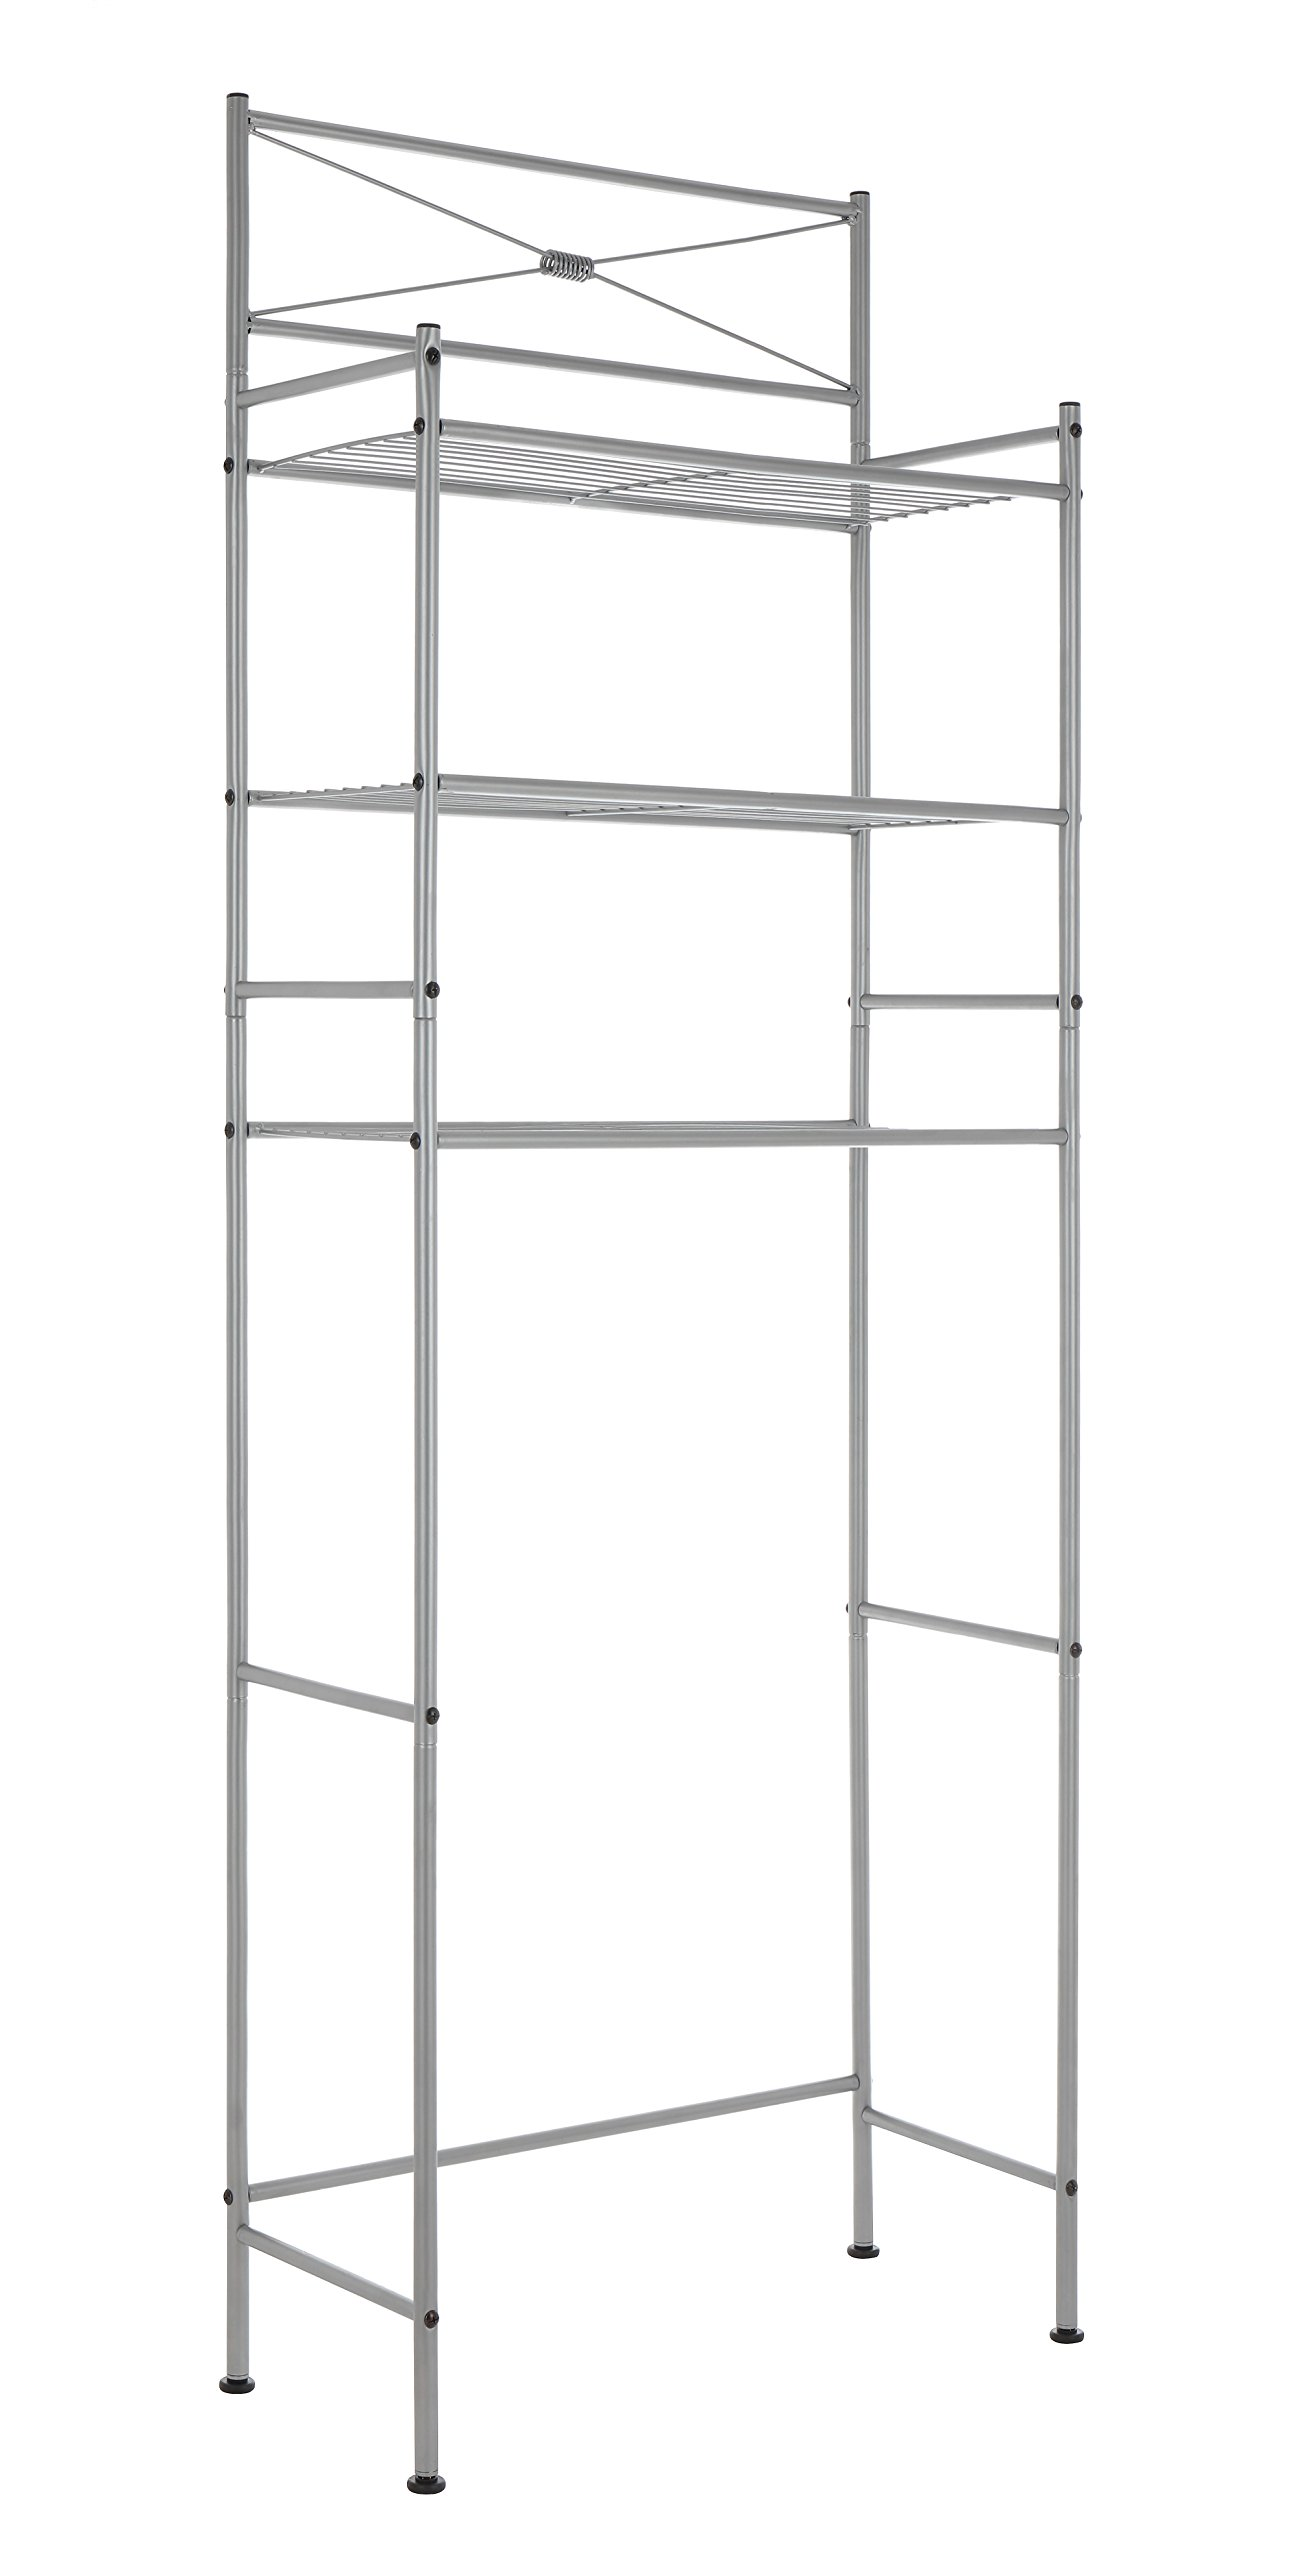 Finnhomy 3 Shelf Bathroom Space Saver Over The Toilet Rack Bathroom Corner Stand Storage Organizer Accessories Bathroom Cabinet Tower Shelf with Nickle Finish 23.5'' W x 10.5'' D x 64.5'' H by Finnhomy